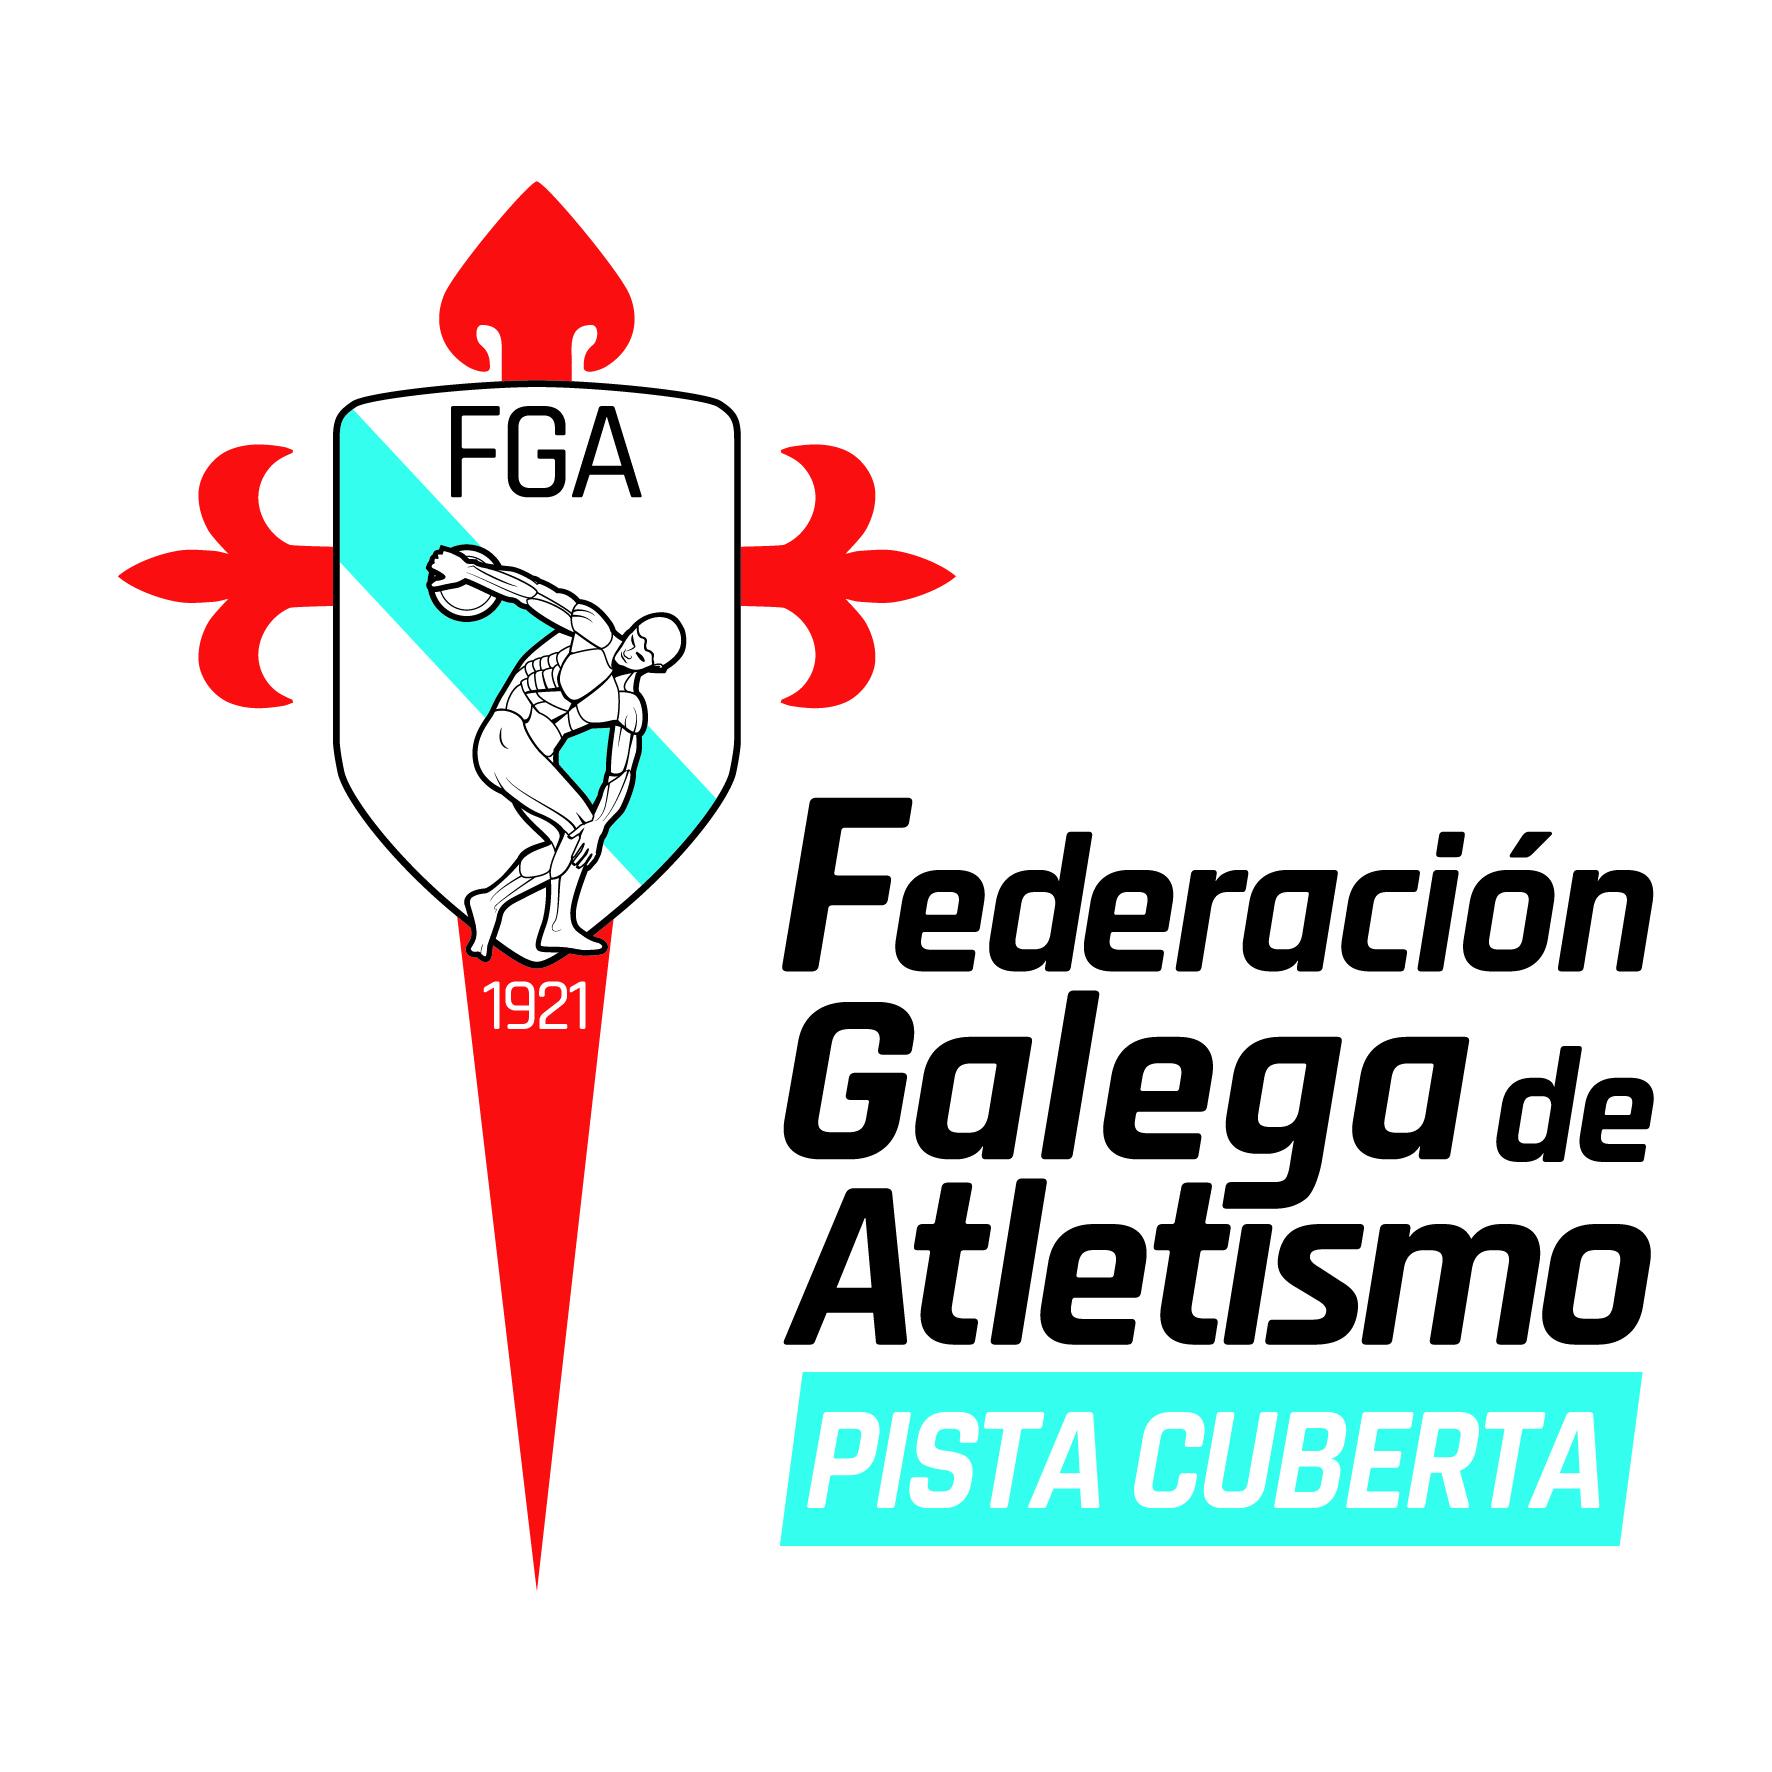 Control de Marcas en Pista Cuberta – A Coruña 2018/2019